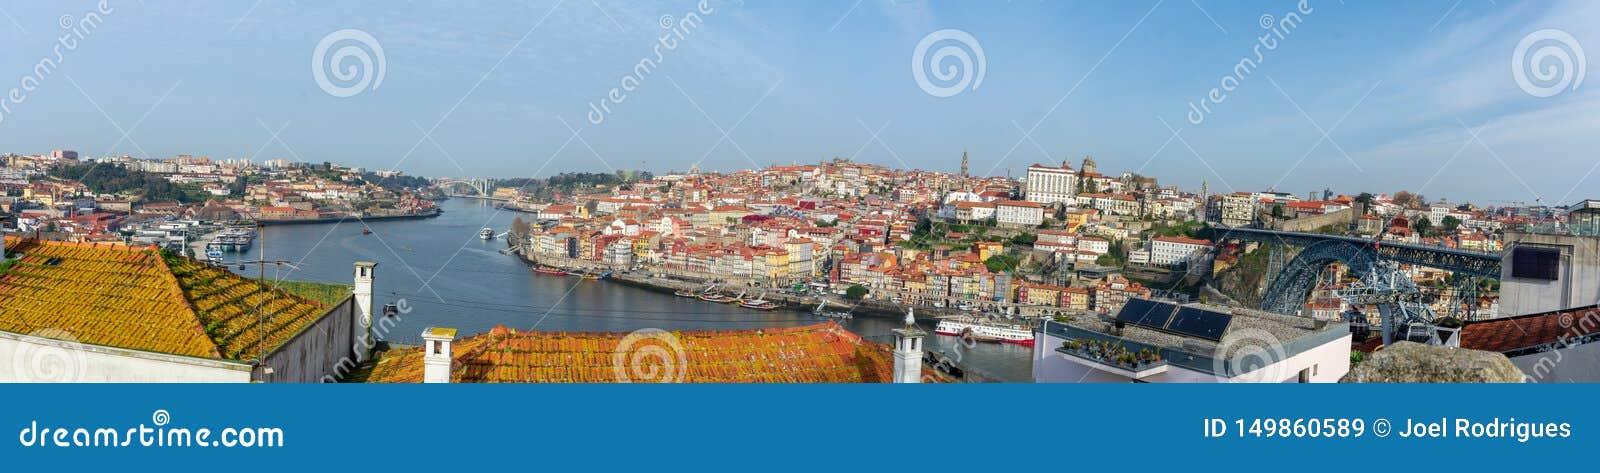 Panorama do centro de Porto como visto do banco do sul do rio de Douro